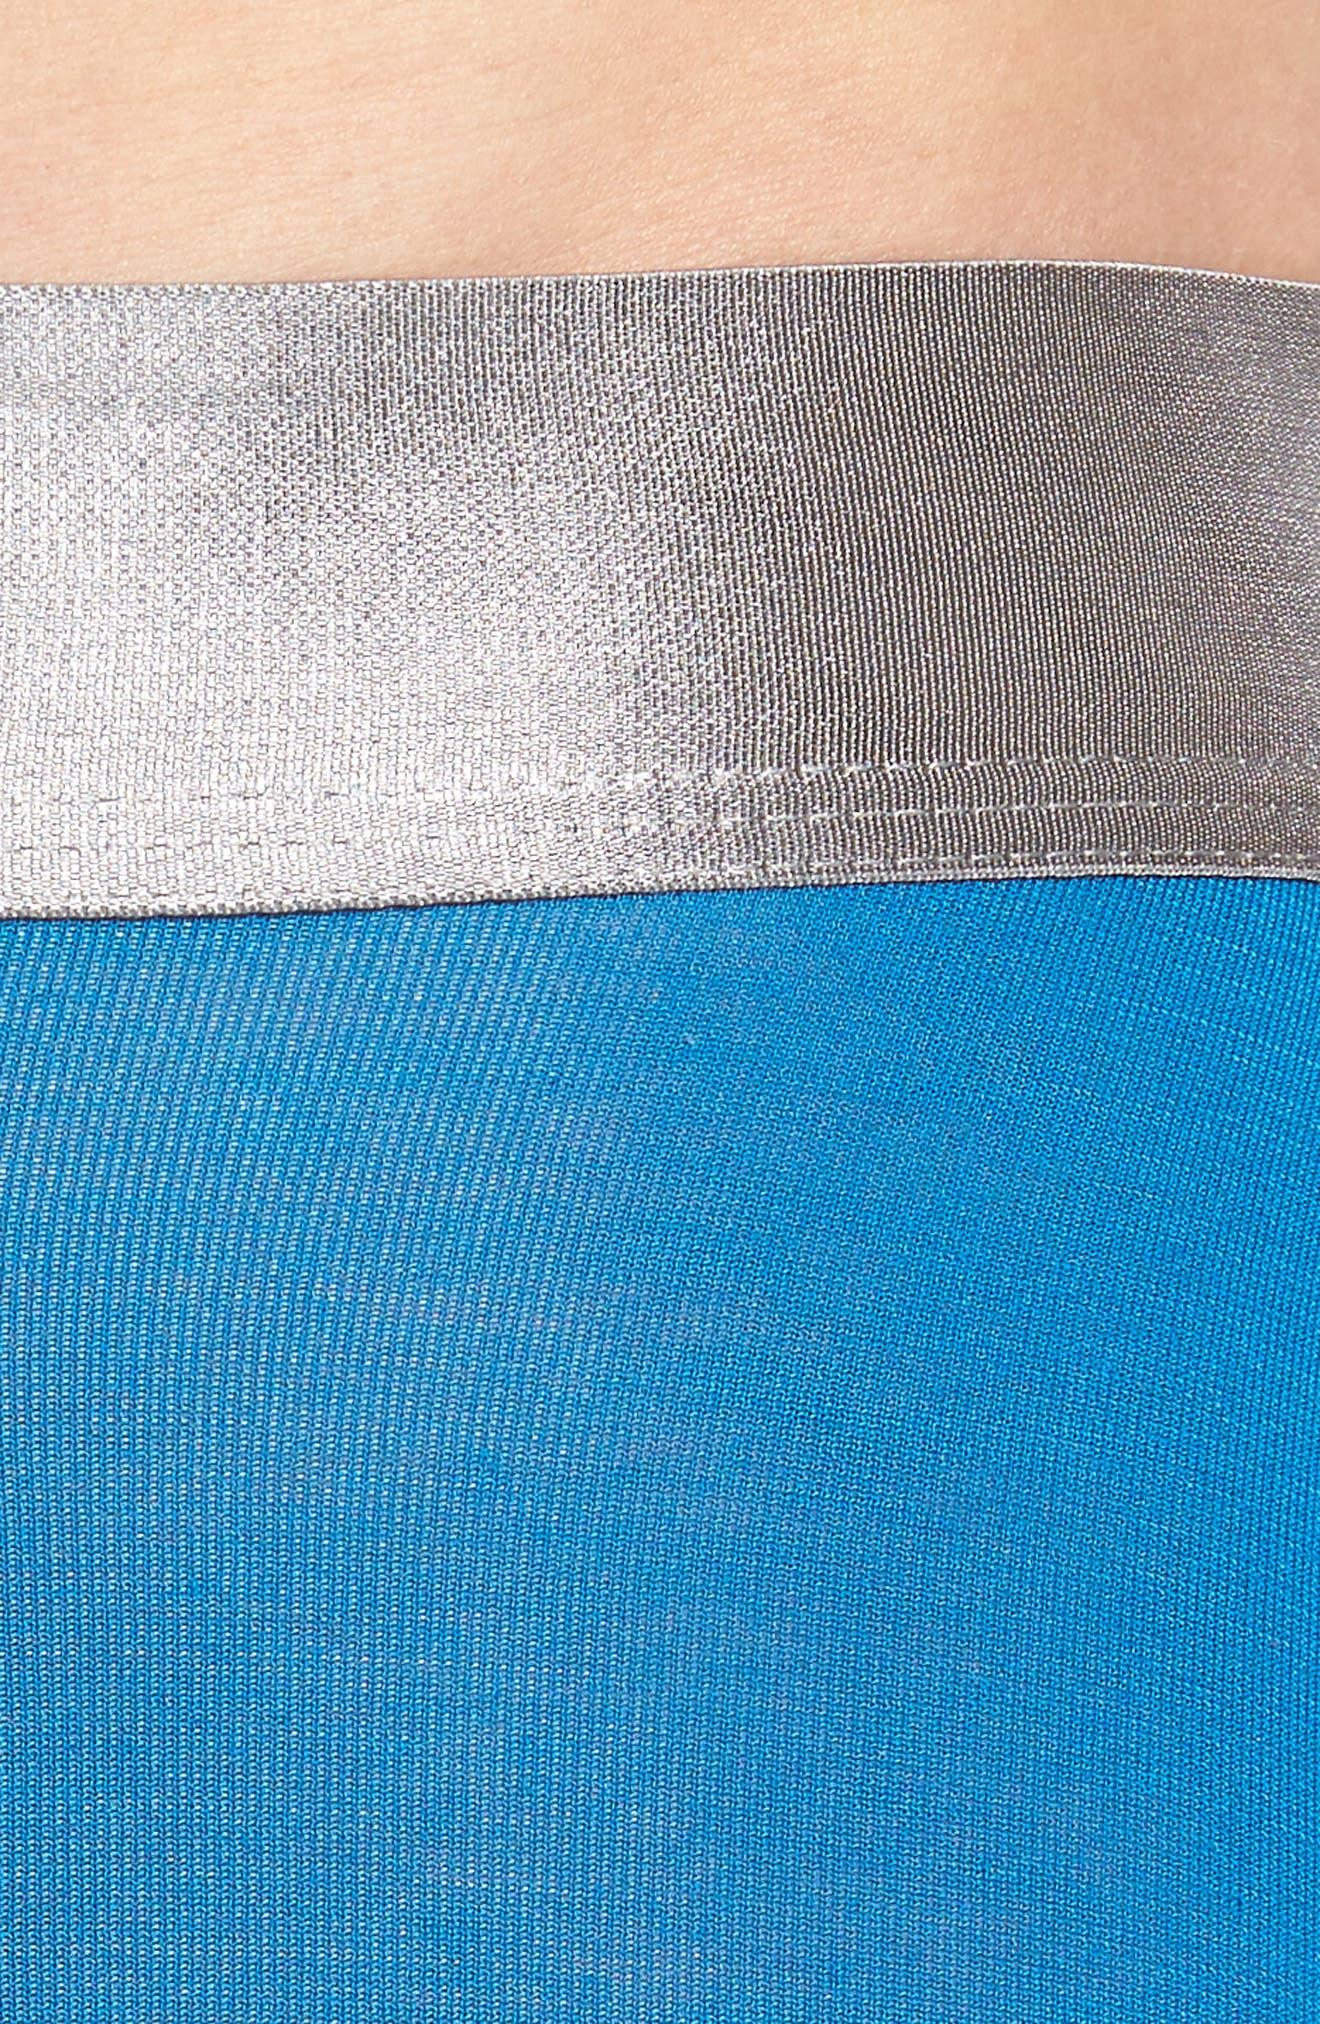 Second Skin Titanium Boxer Briefs,                             Alternate thumbnail 4, color,                             Imperial Blue